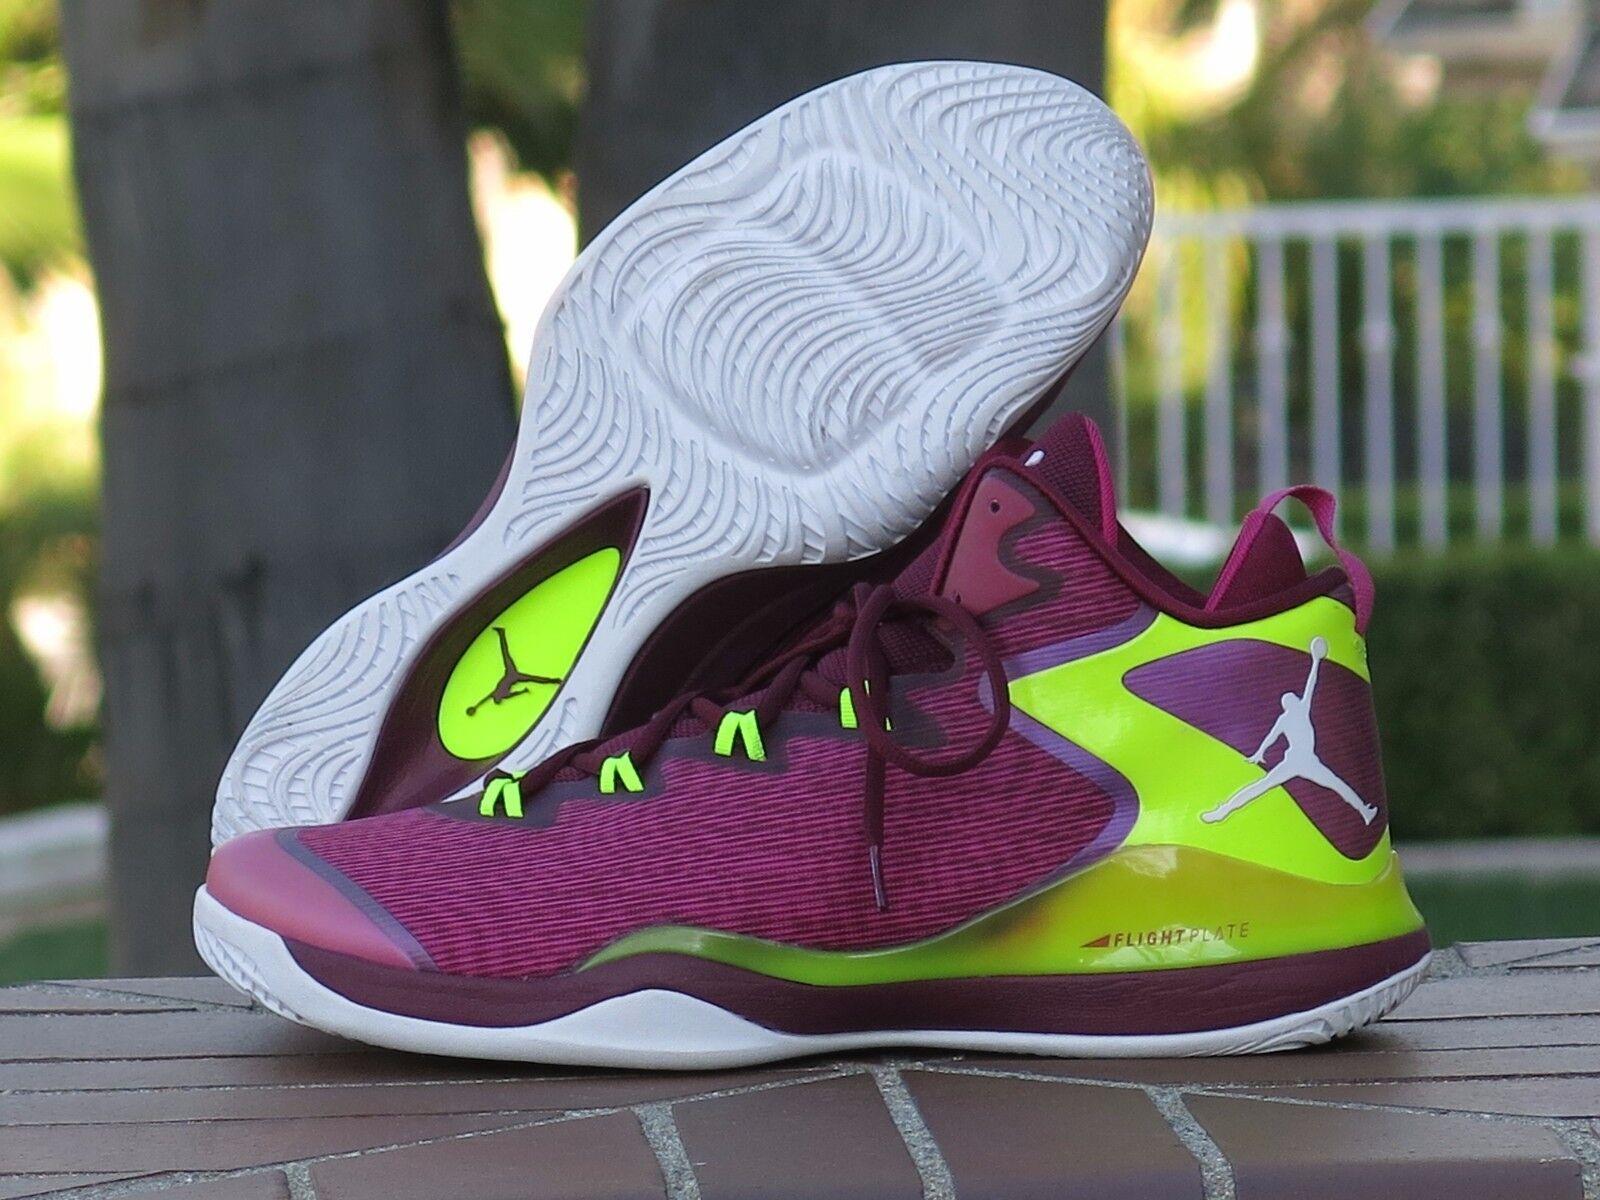 Nike air air Nike jordan super.fly 3 retrò limitata uomini scarpe da basket 684933-615 sz) c5887d